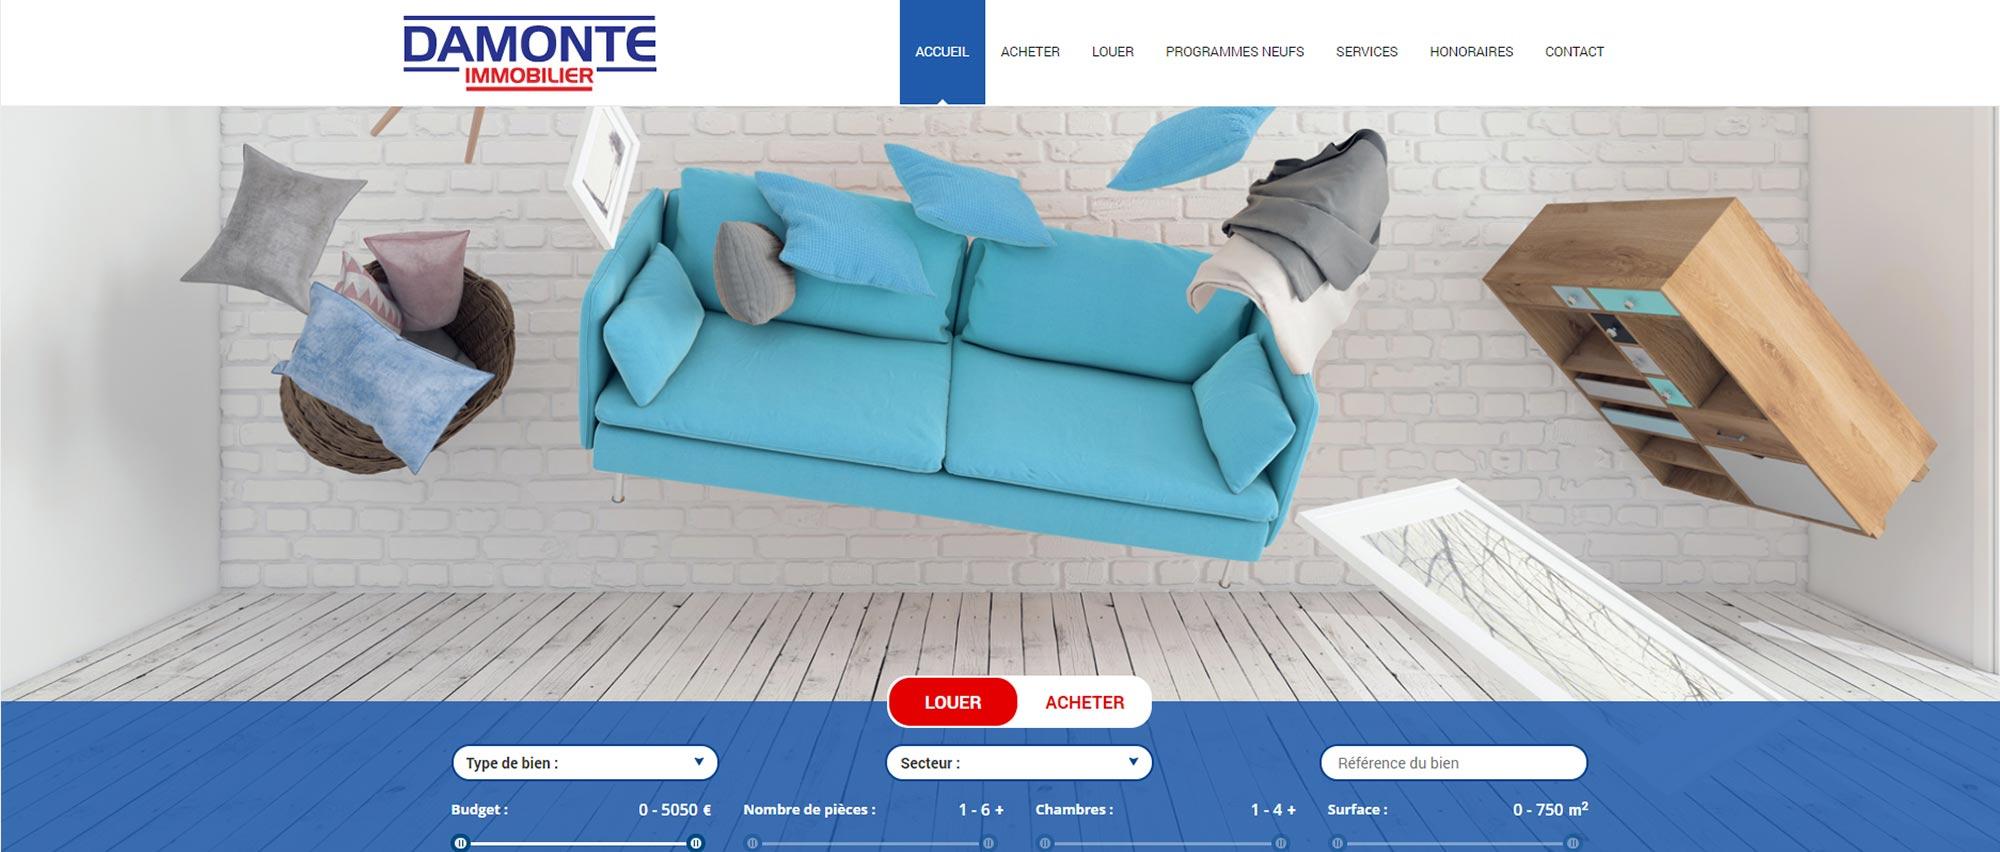 ikadia-portfolio-damonte-immobilier-fond5